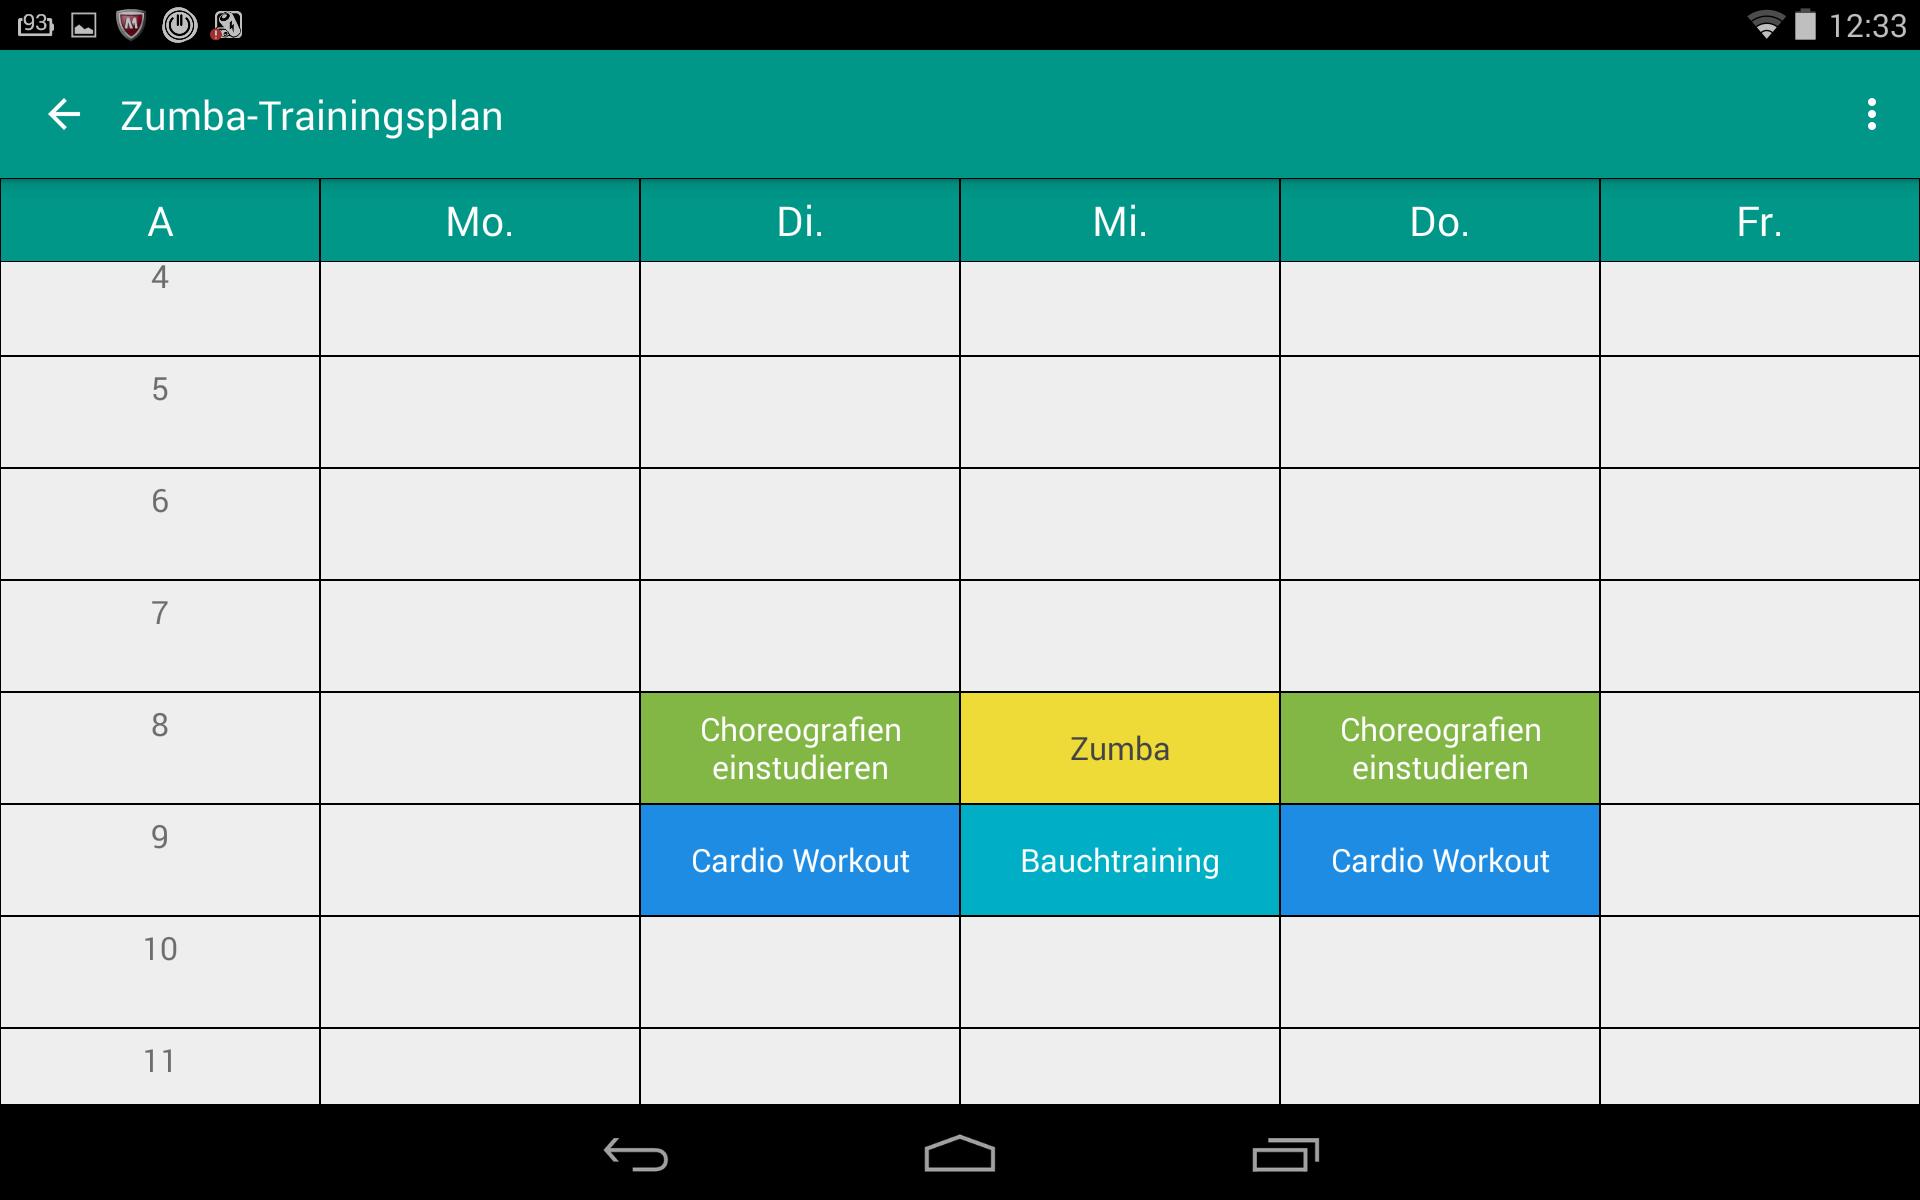 Zeitplanungs-App Stundenplan im Kurztest - Android News